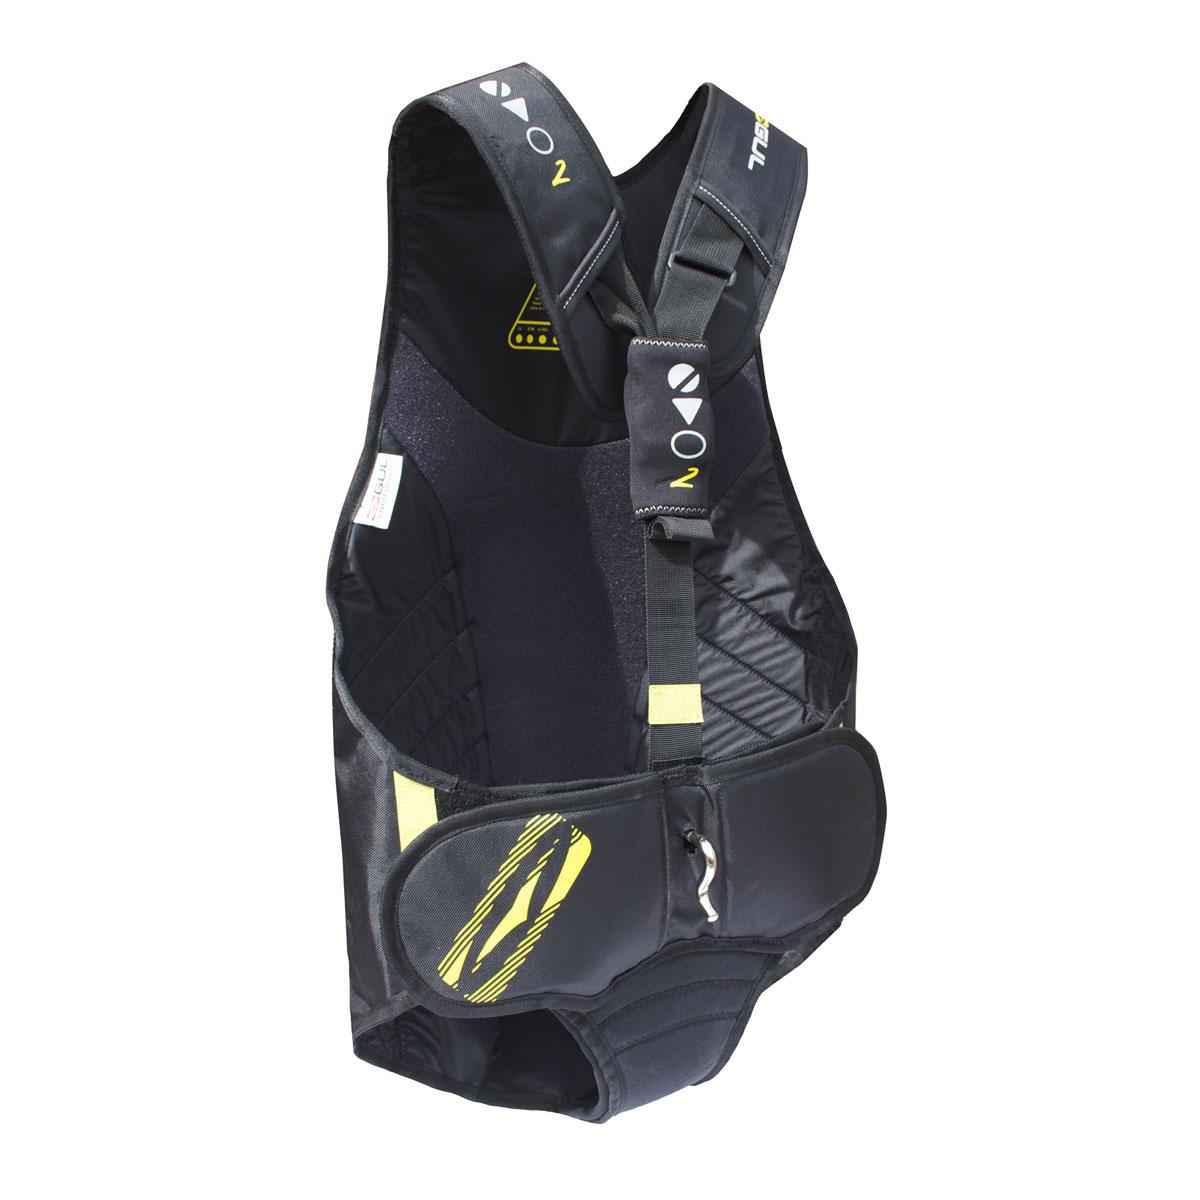 Gul EVO2 Trapeze Harness 2018  Black  Coast Water Sports